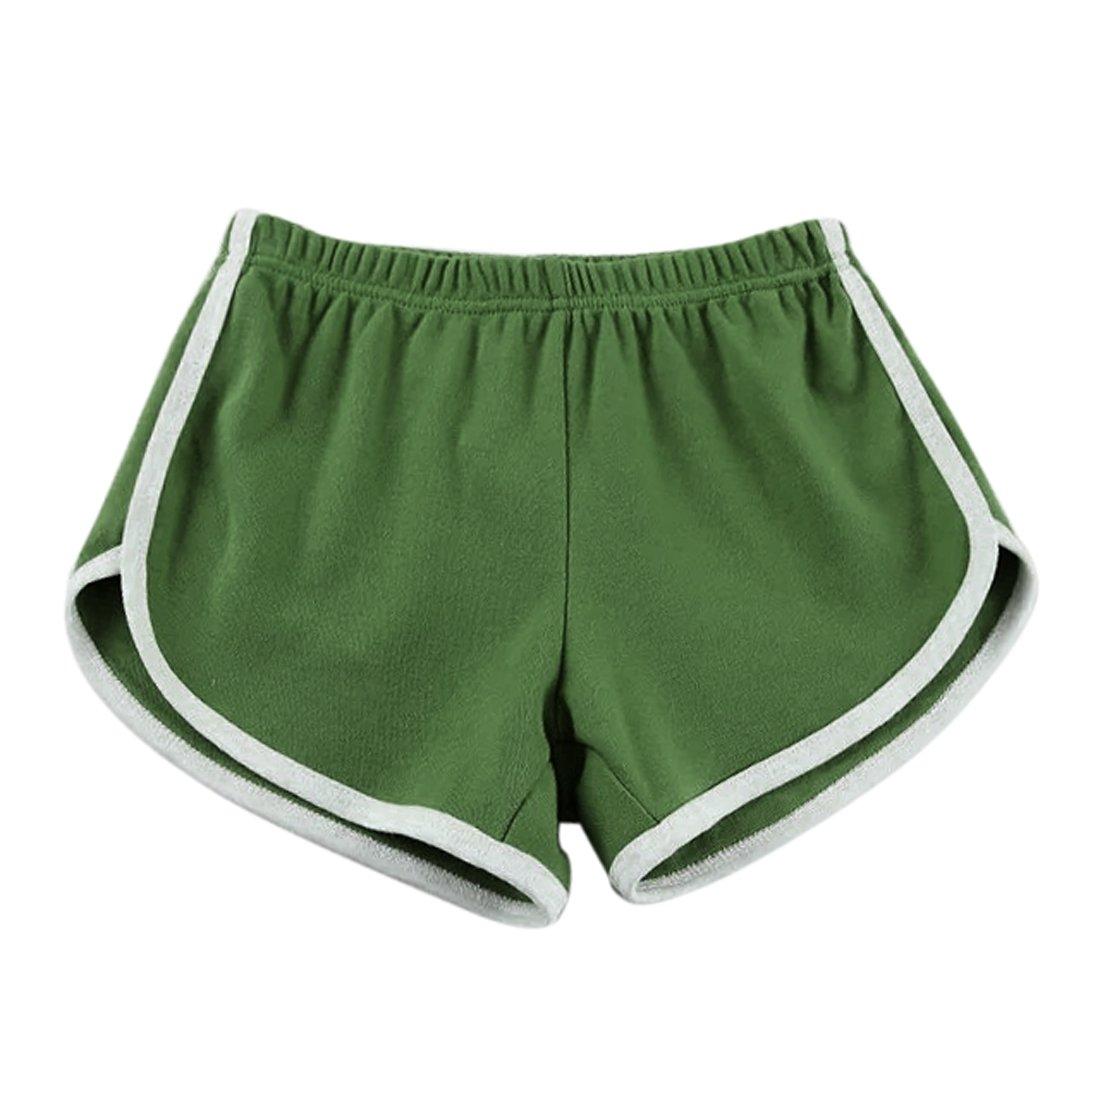 a47adac0d1e96 Wenyujh Damen Frauen Shorts Sport-Short Sporthose Hot Pants für Yoga Strand  Jogging